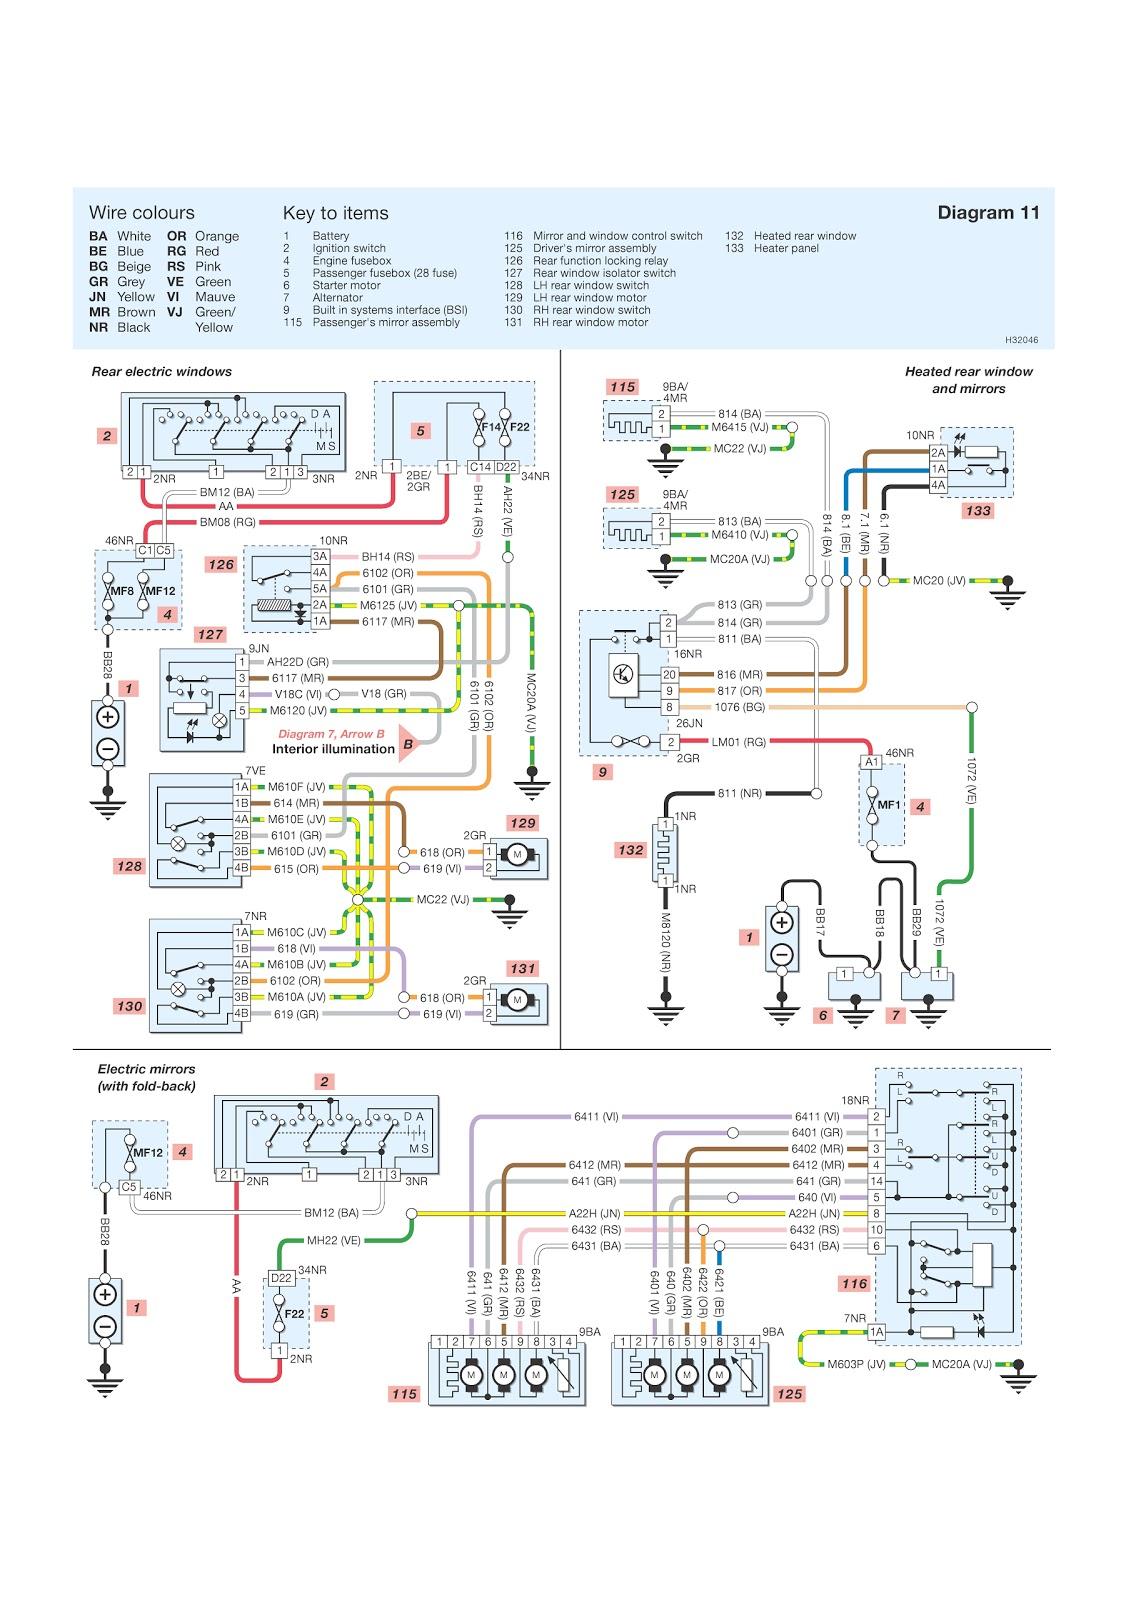 hight resolution of  hunter src wiring diagram on 2 speed fan switch wiring diagram hunter fan control wiring